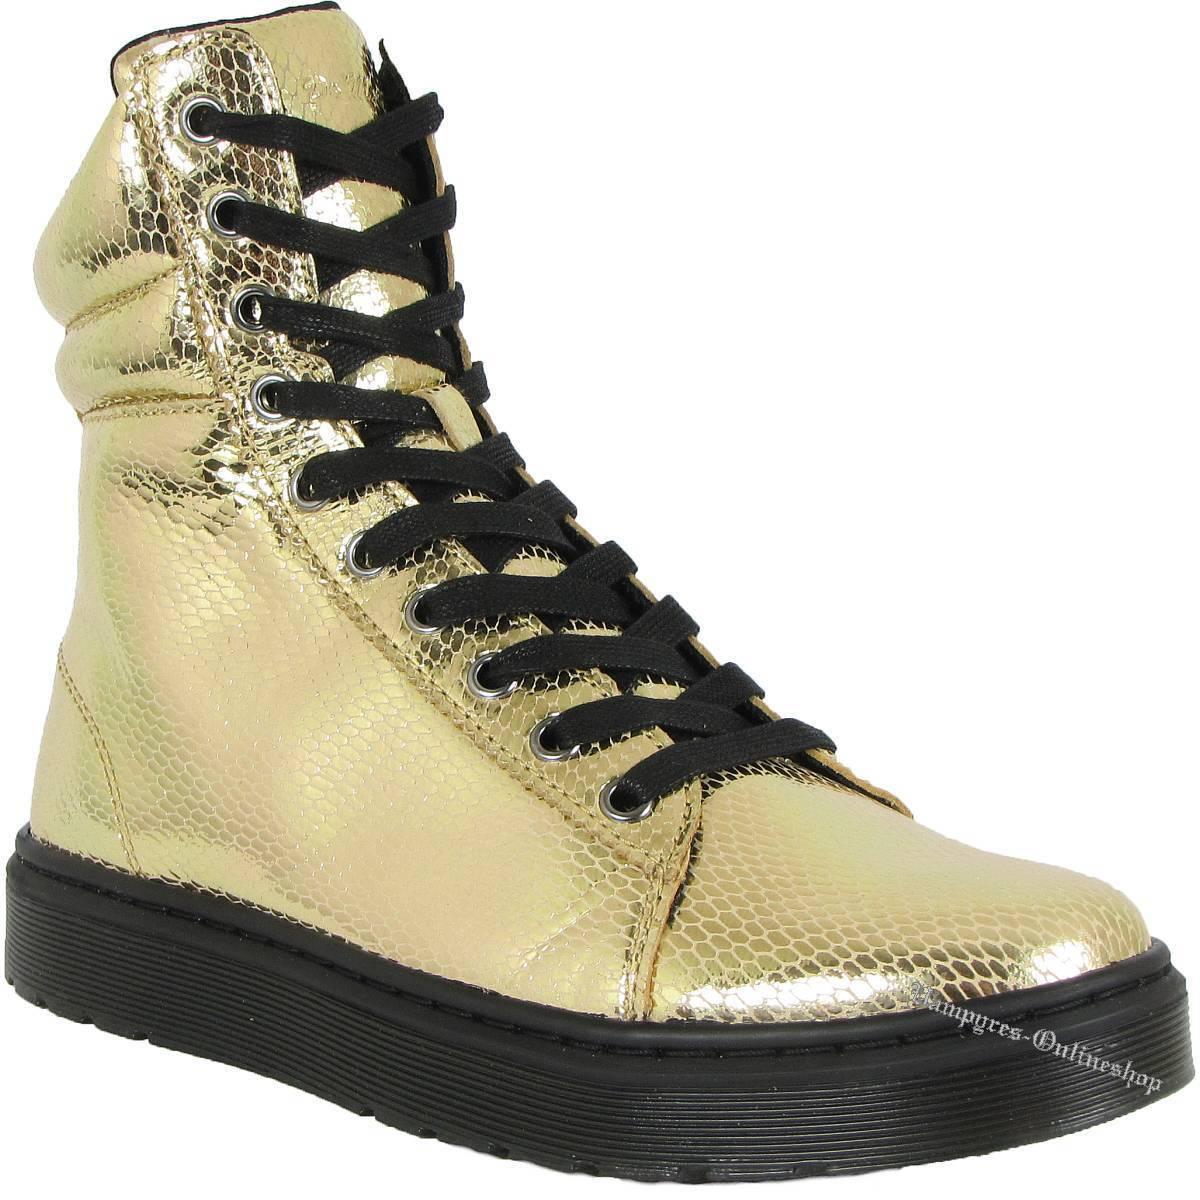 Dr. Martens Snake 10-Loch Mix Mini Metallic Snake Martens Oro 15319710 Docs Sneaker Air Wair 20ea03